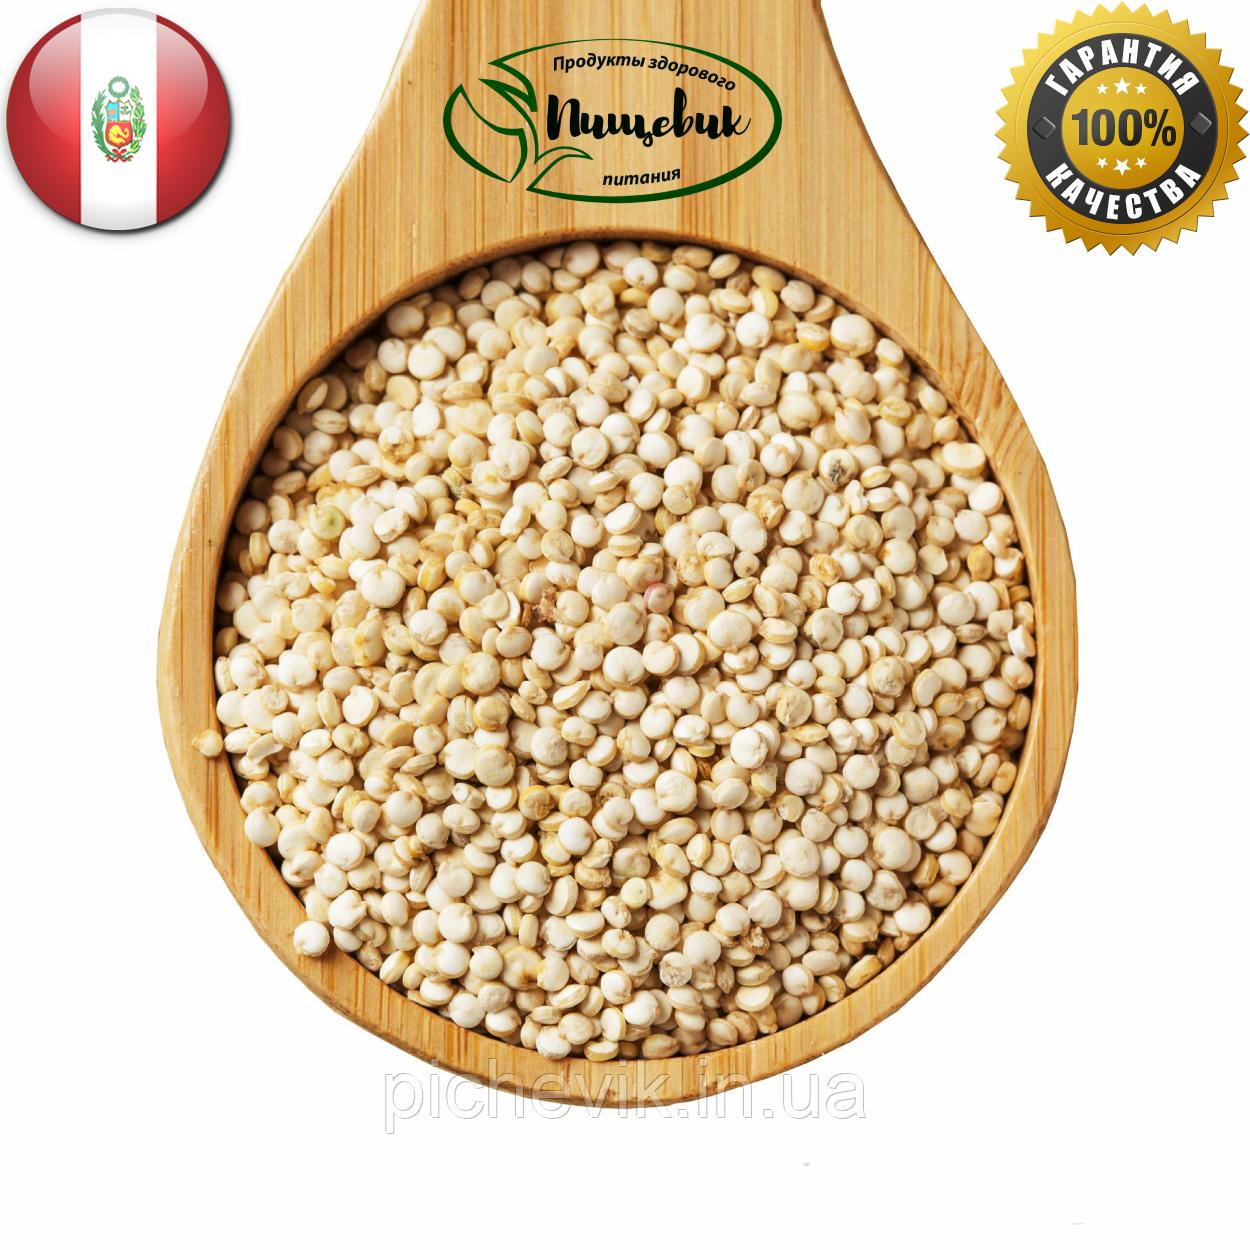 Семена Киноа белые (Перу) Вес: 500 гр